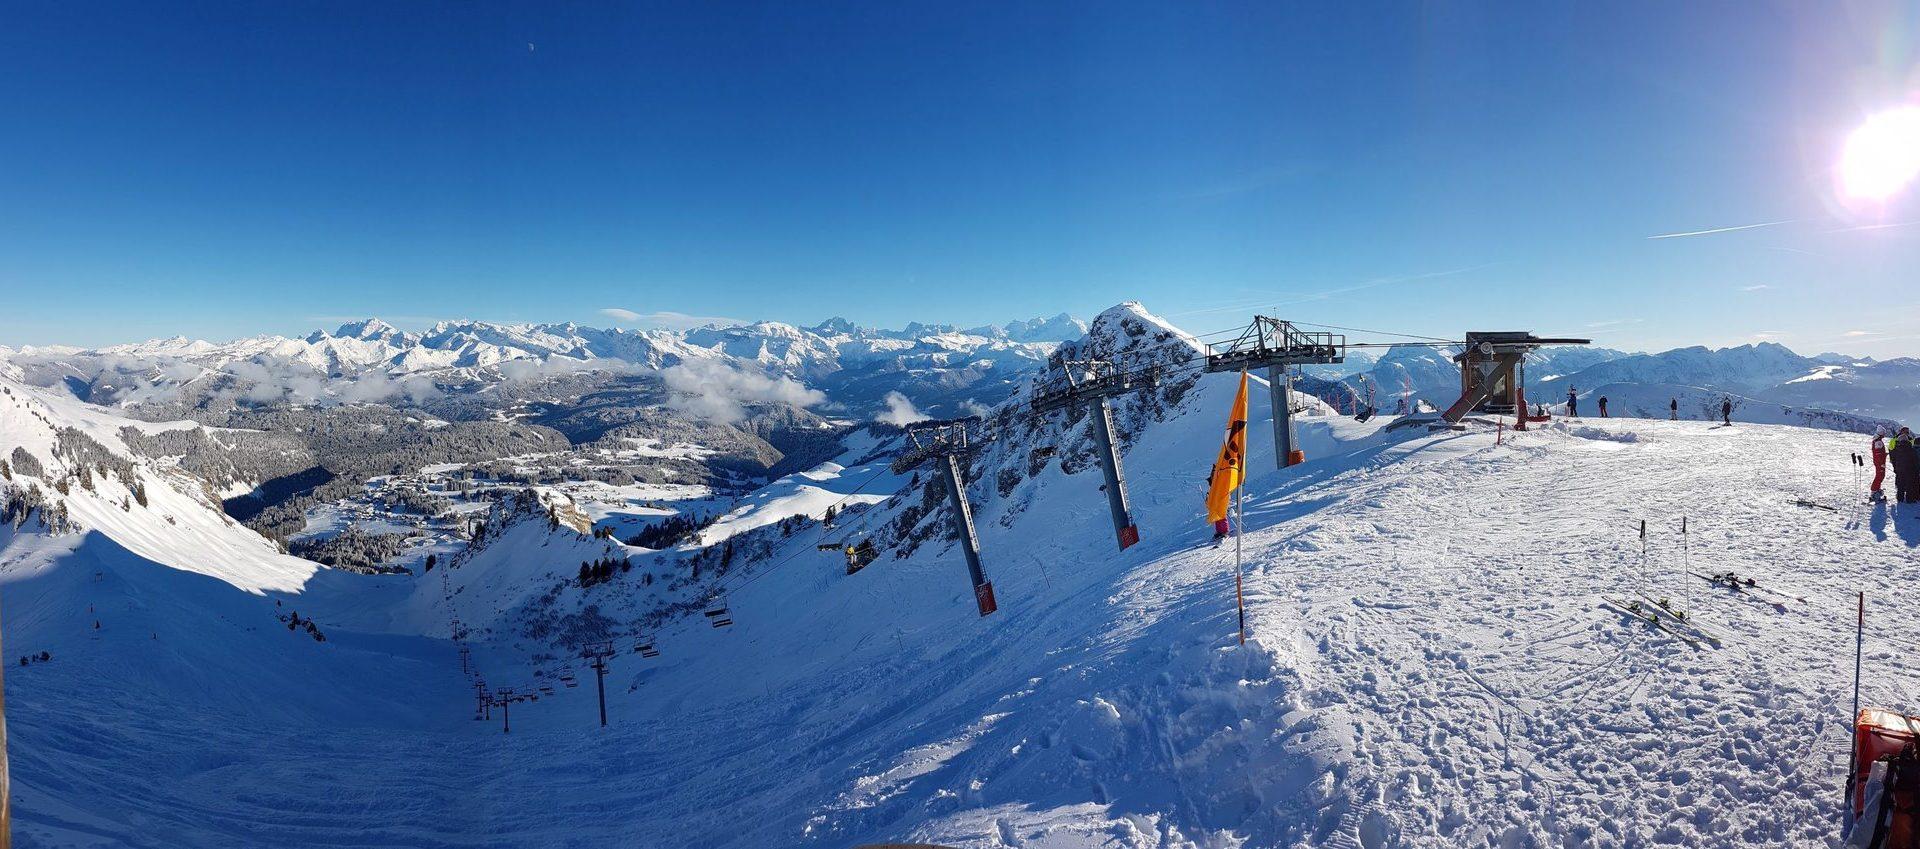 Domaine skiable - Praz de Lys Sommand